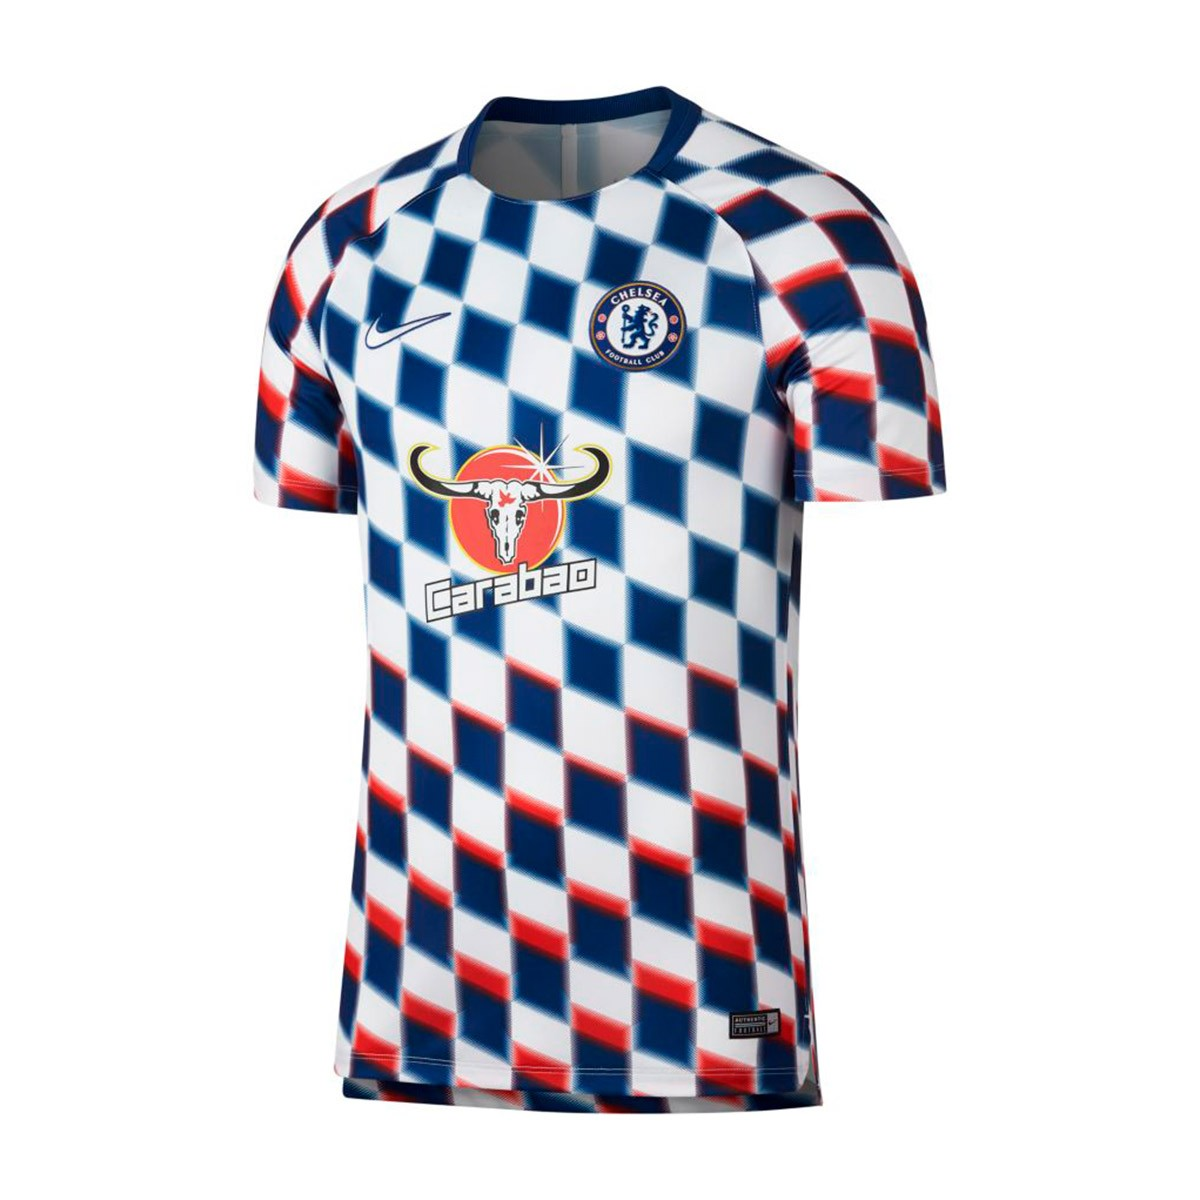 122953c091 Jersey Nike Chelsea FC Squad 2018-2019 White-Rush blue-White ...